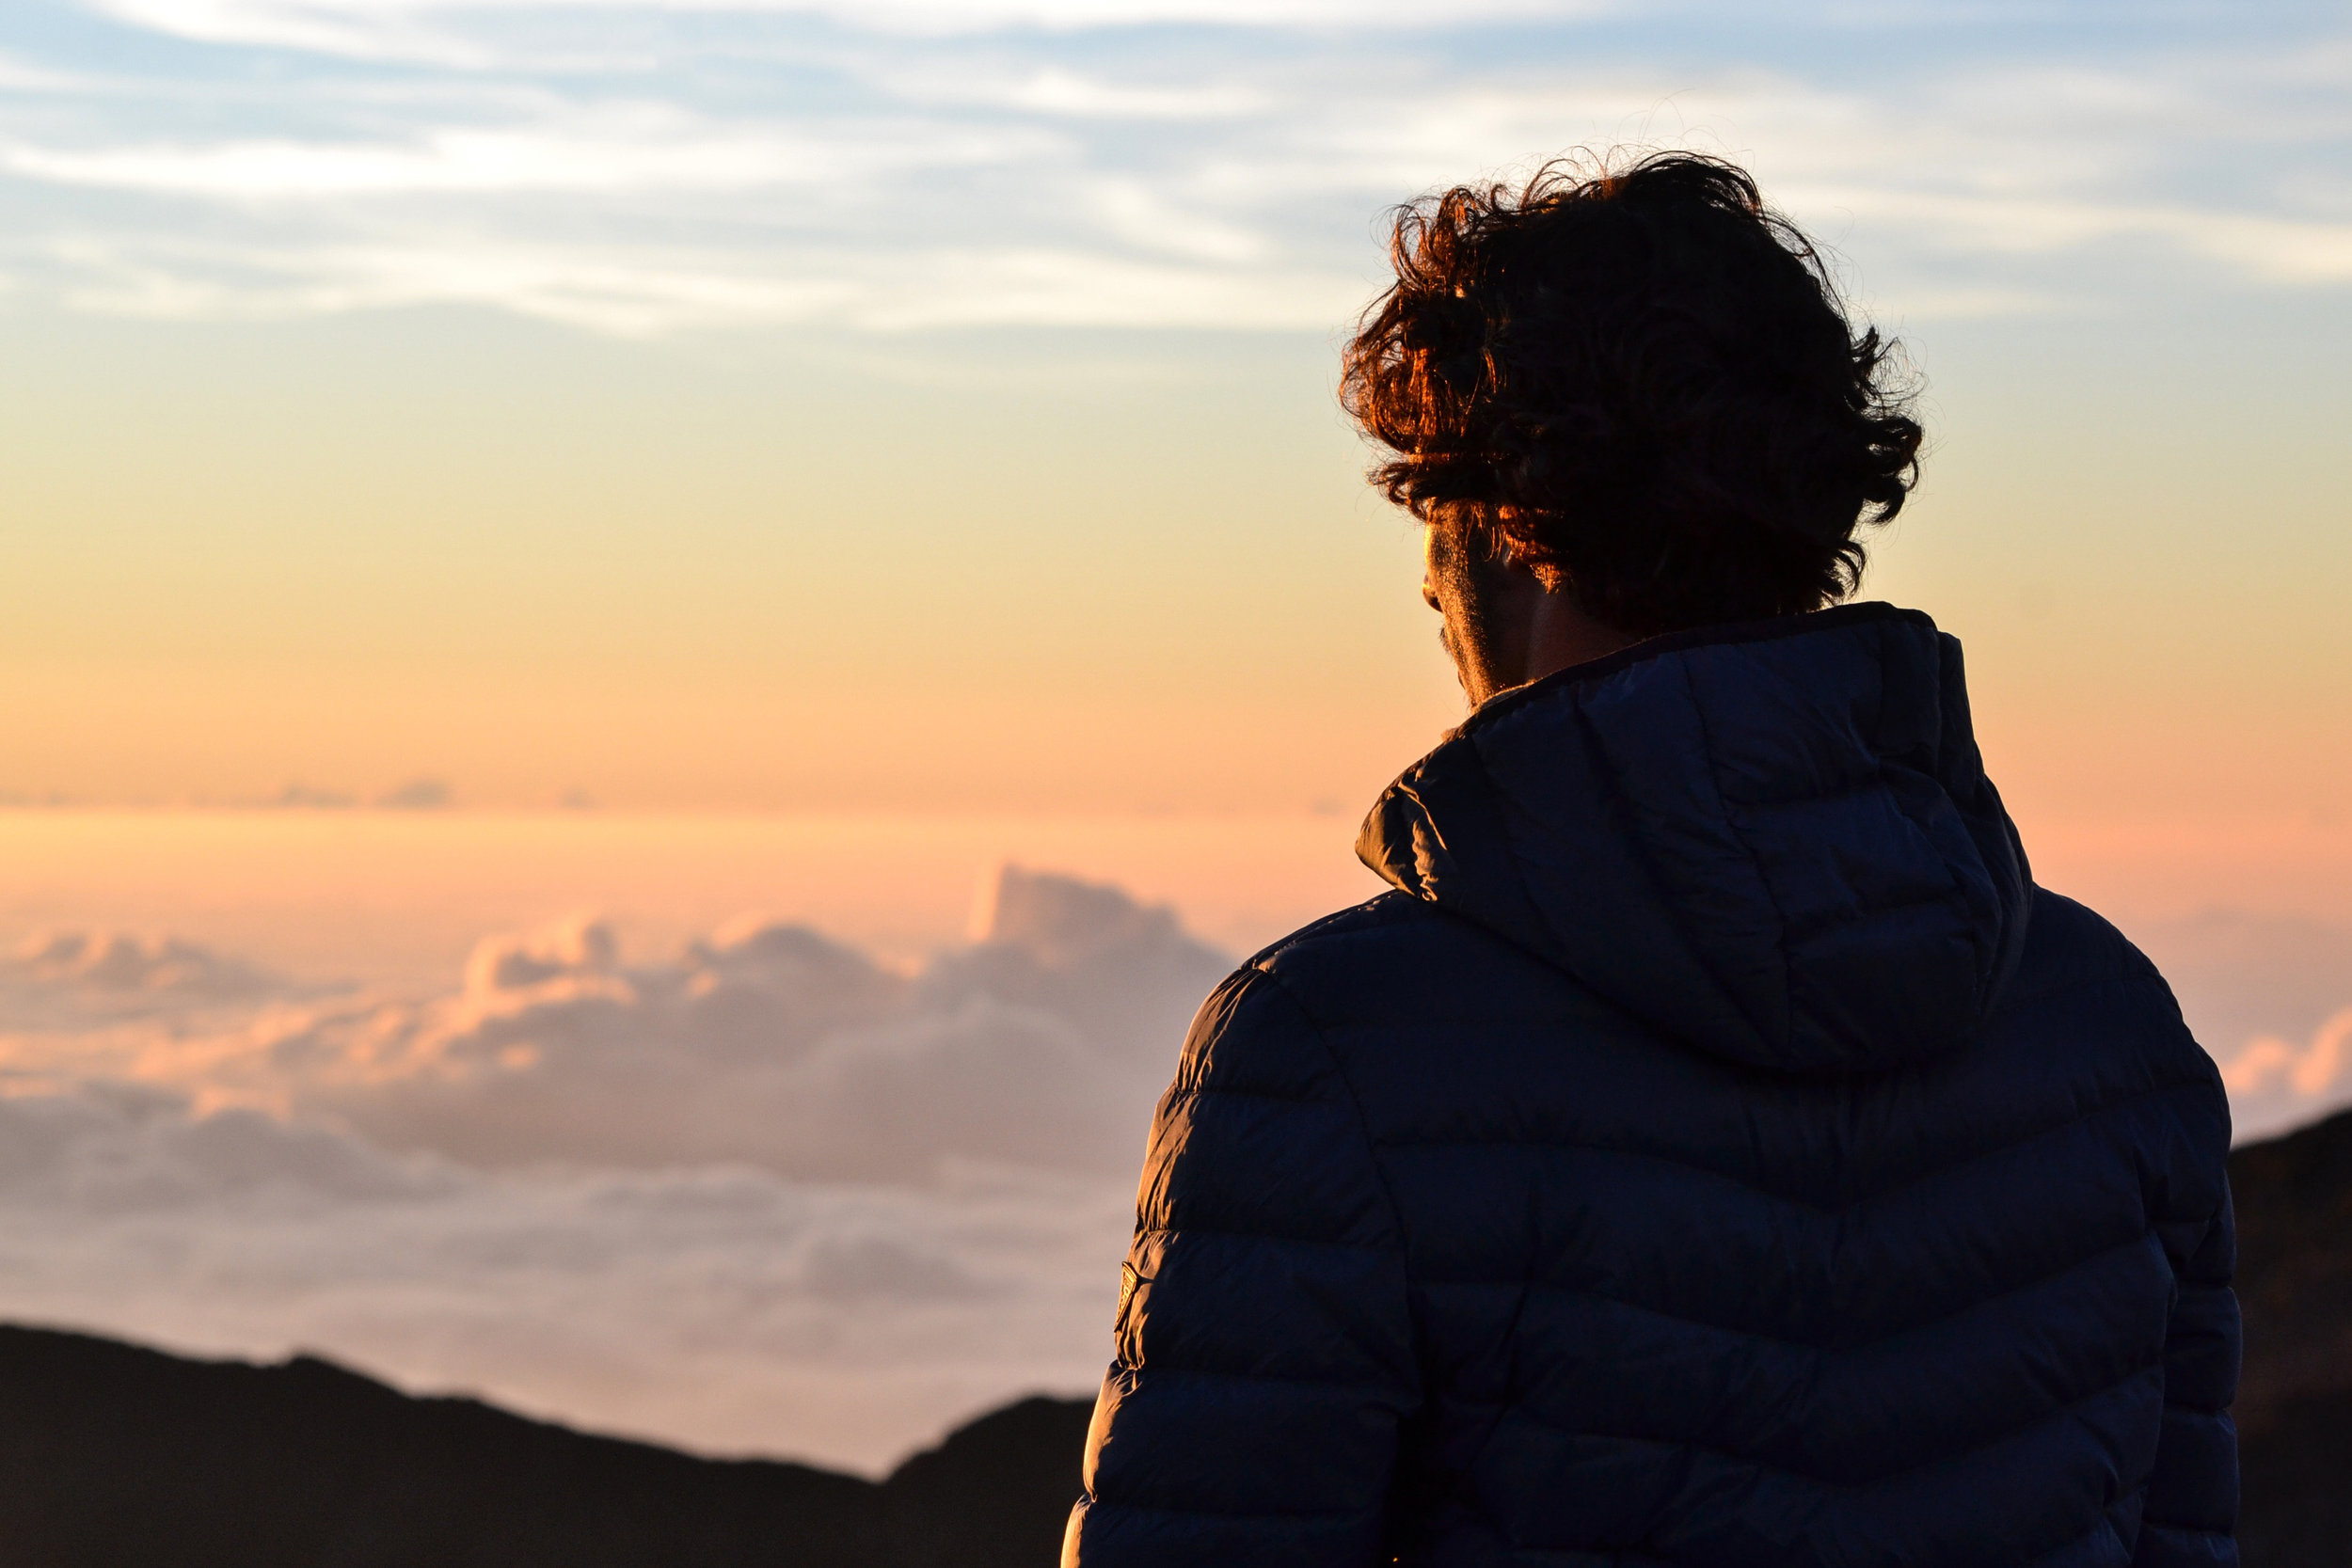 man-sunset-view.jpg